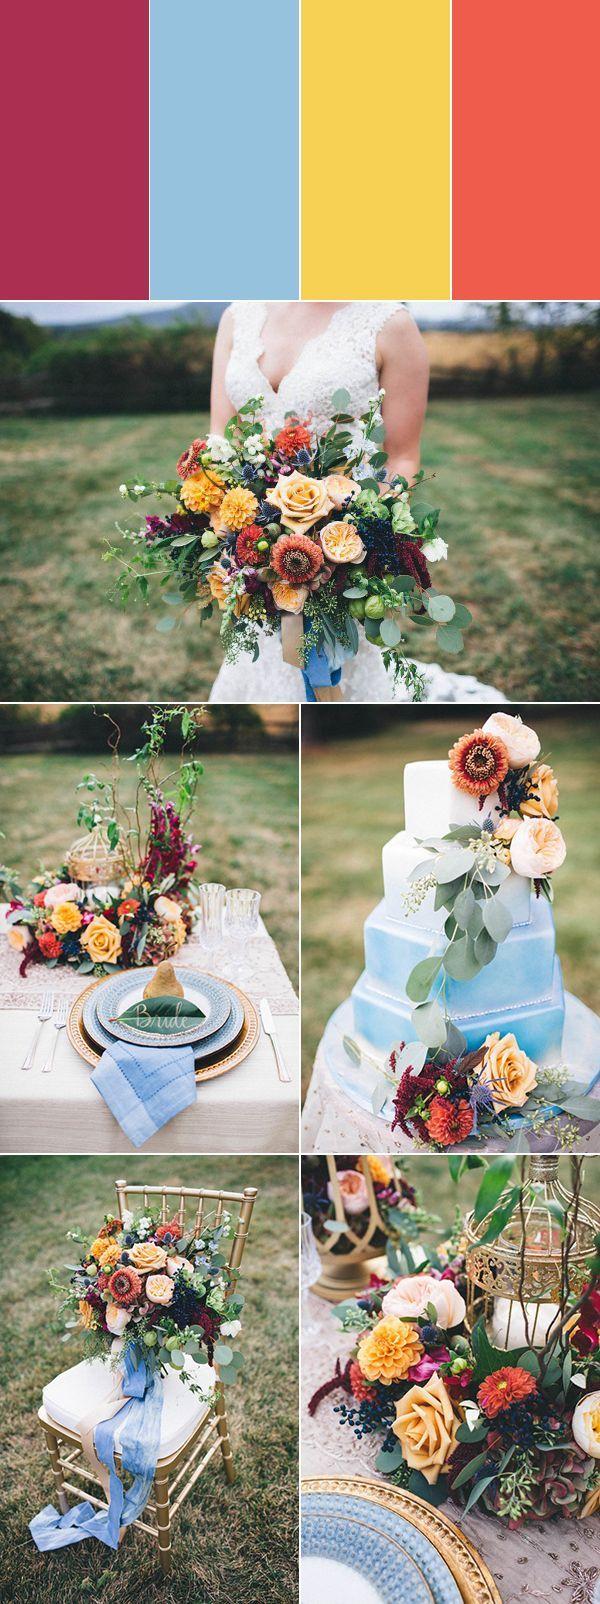 Wedding decorations rose gold october 2018 Pin by Jess Thomas on Wedding Decorflowers  Pinterest  Wedding